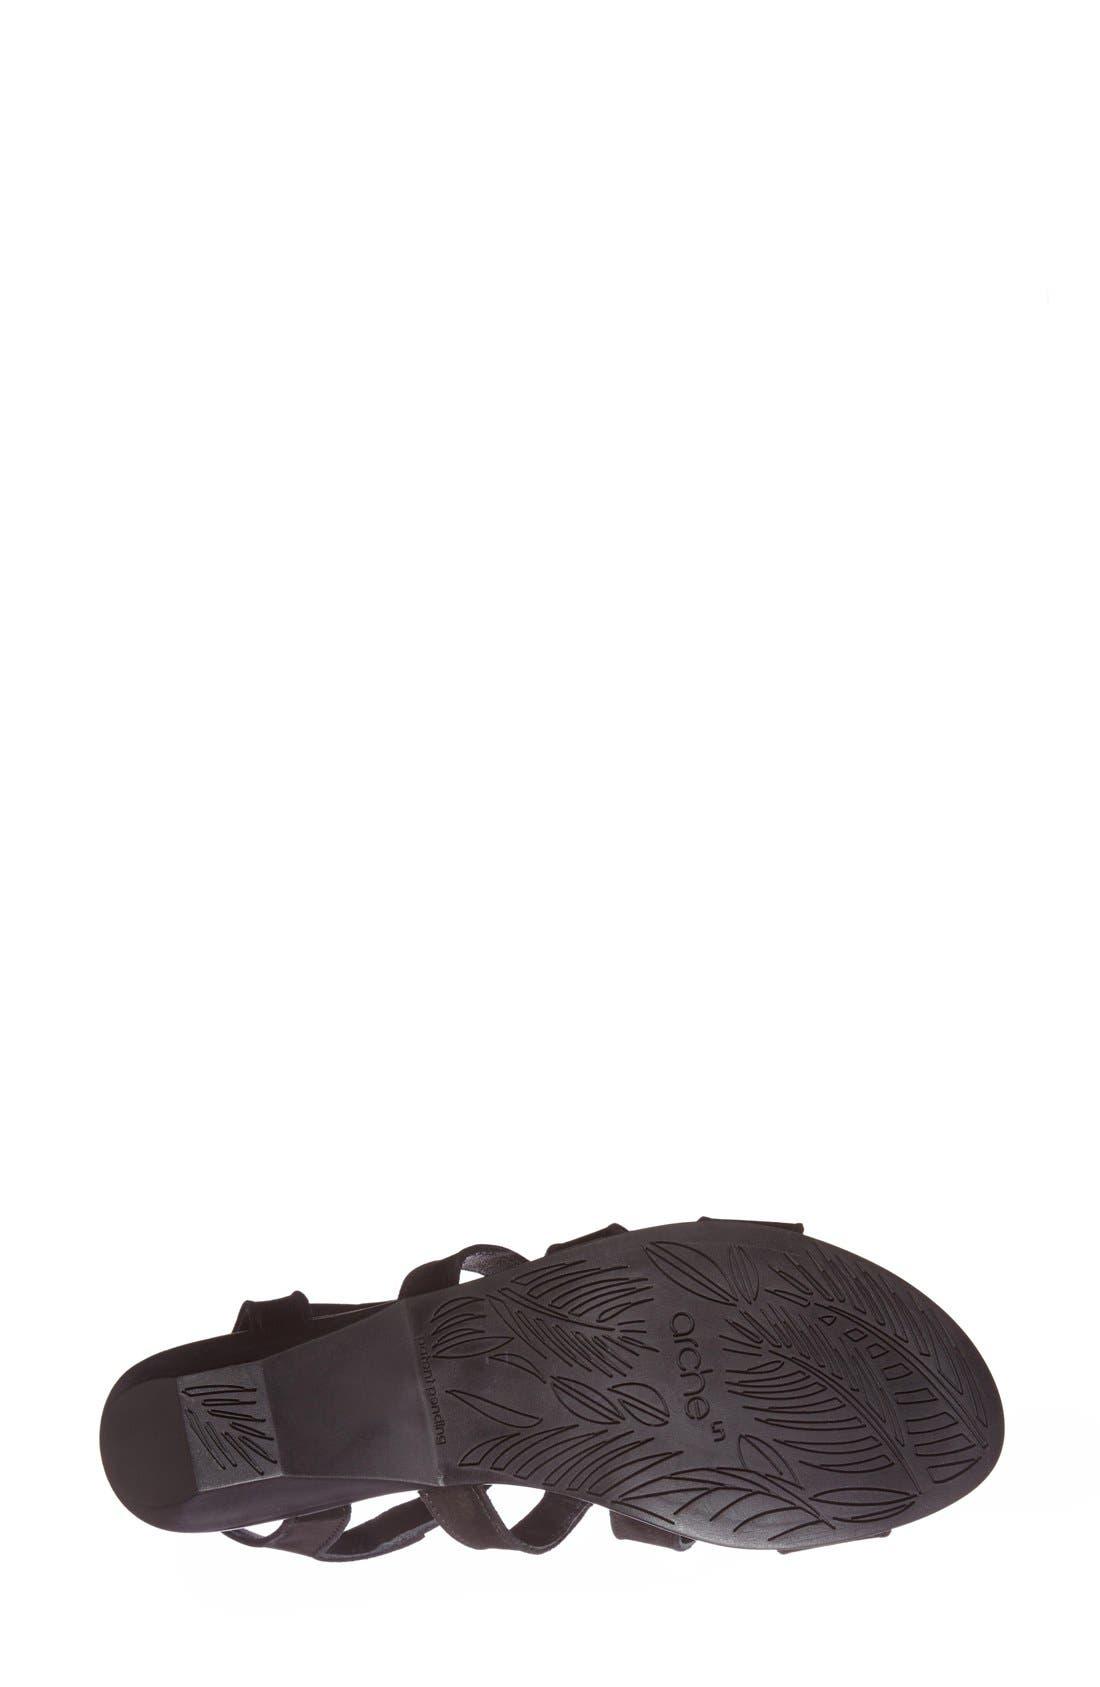 'Obela' Water Resistant Leather Sandal,                             Alternate thumbnail 20, color,